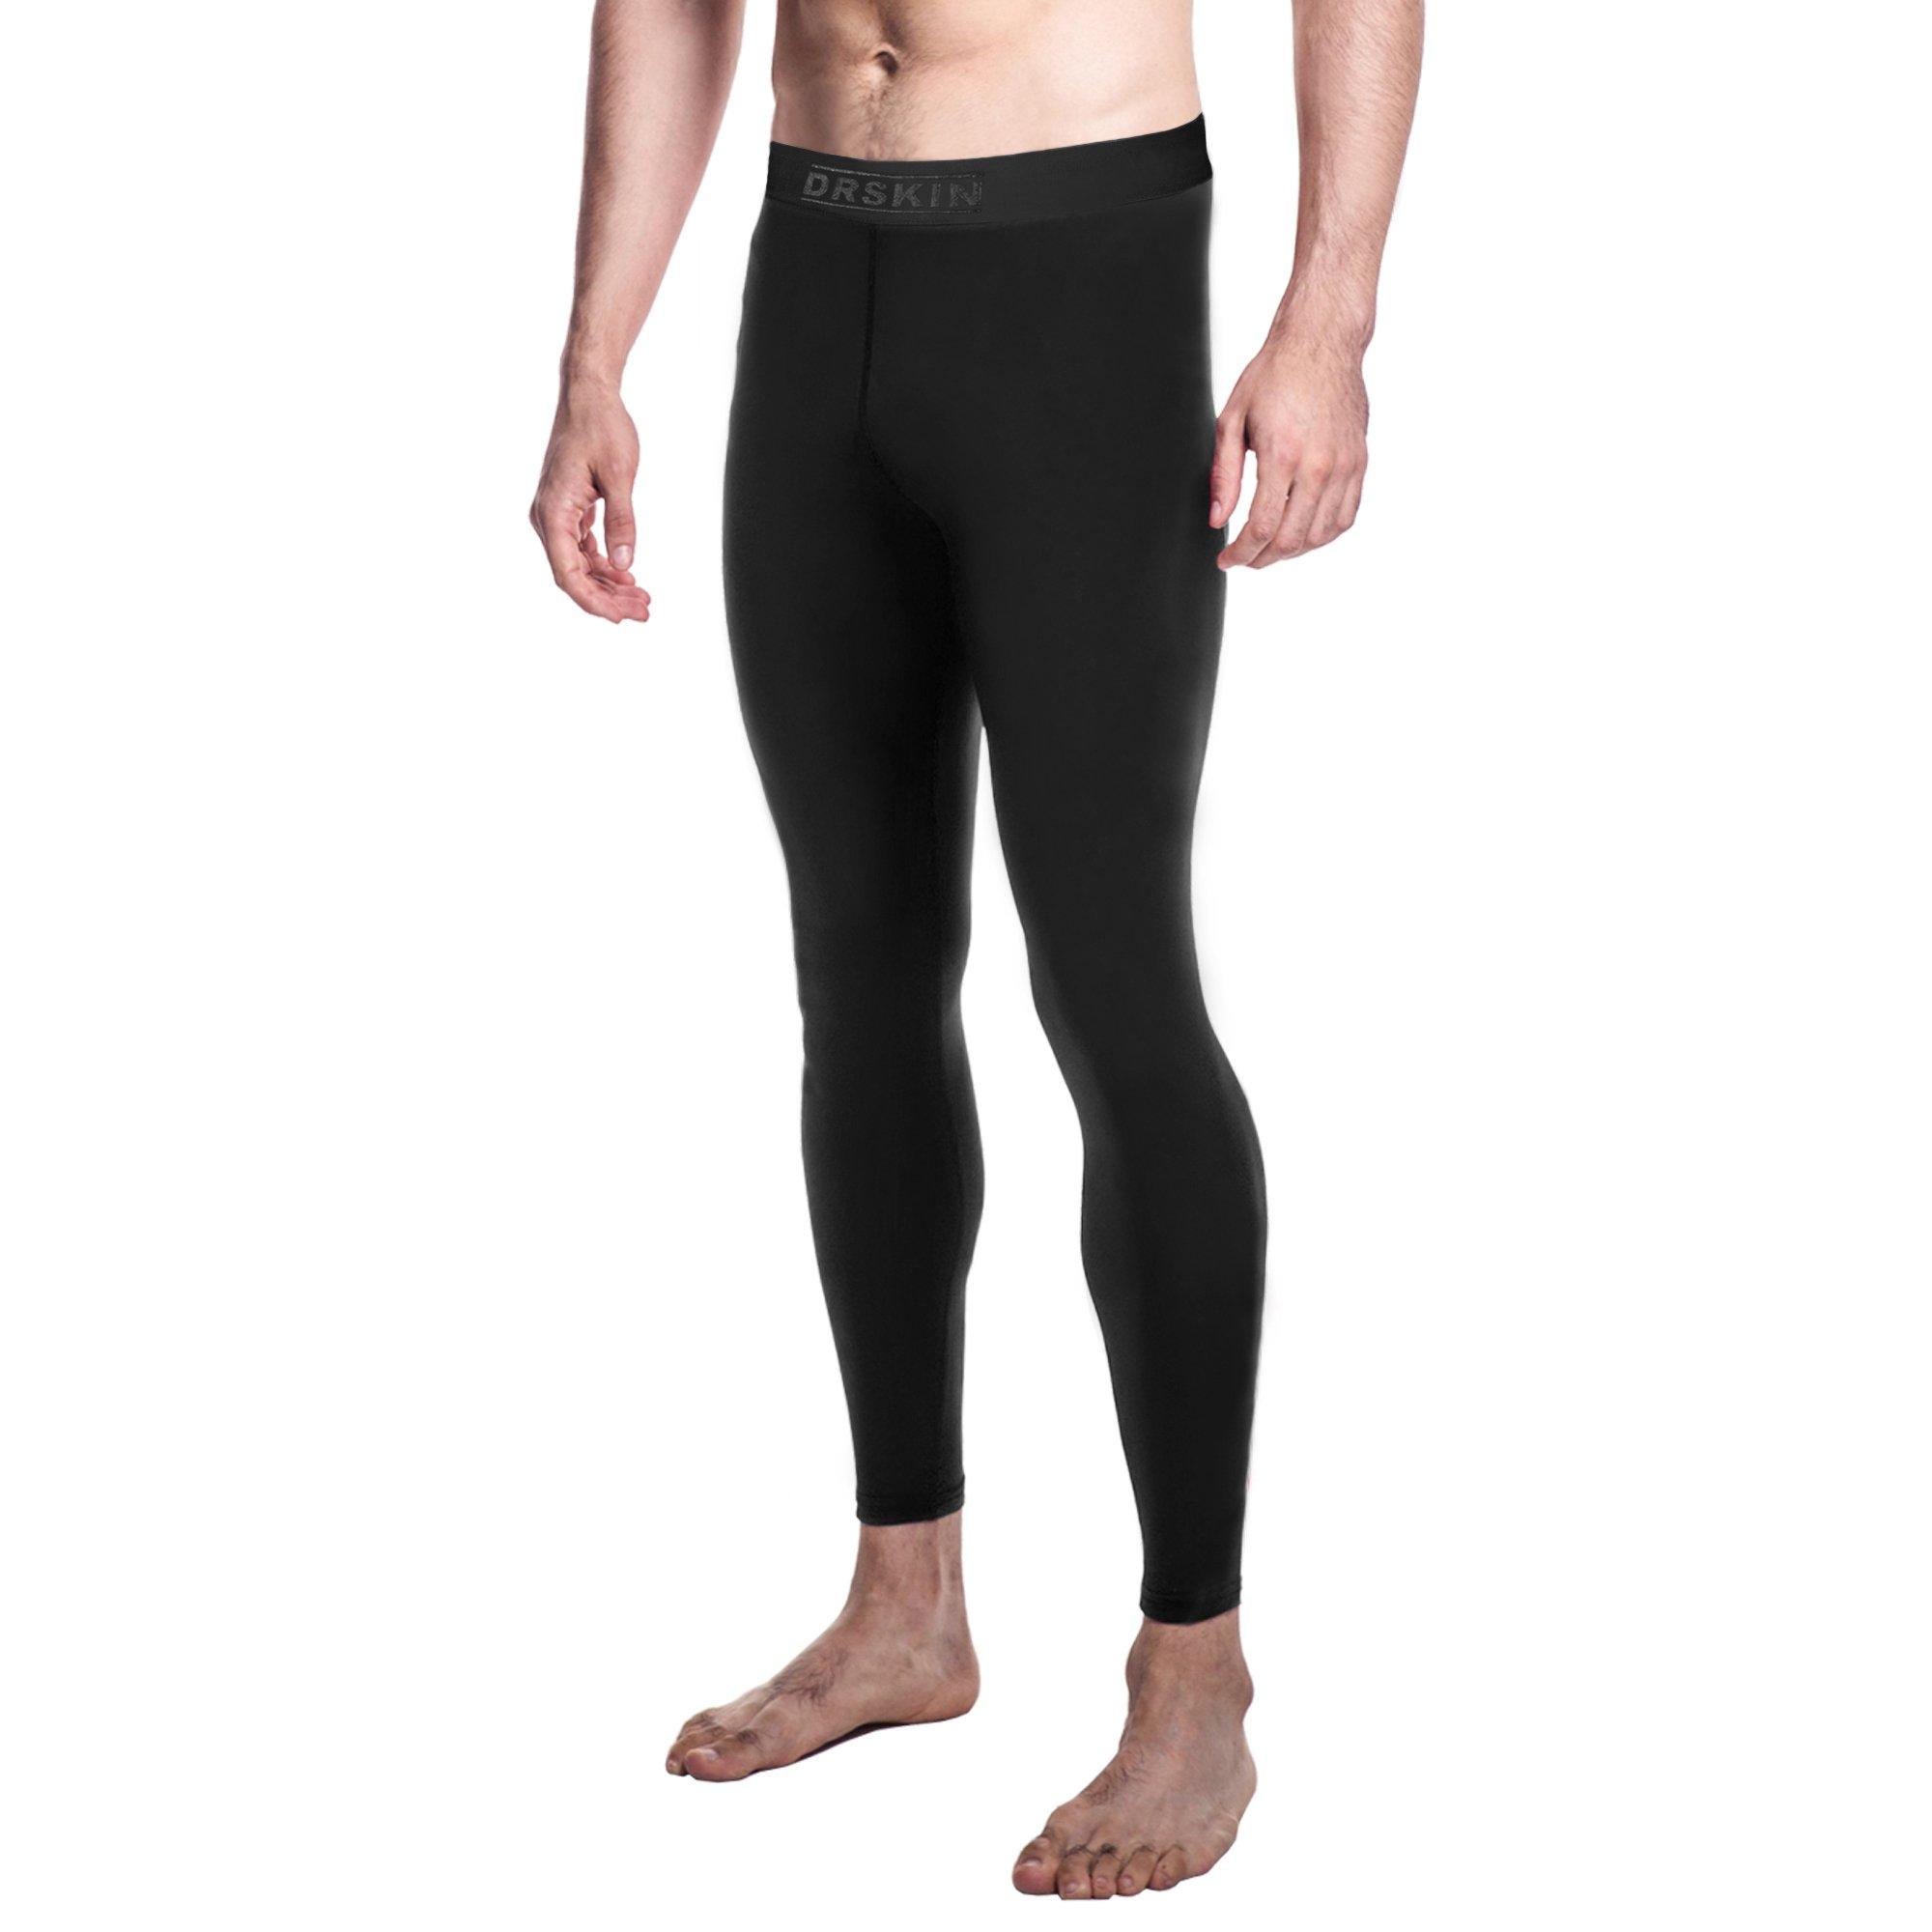 06c2bca047223 Galleon - DRSKIN Compression Cool Dry Sports Tights Pants Baselayer Running  Leggings Yoga Rashguard Men (Silicon BB01, 2XL)